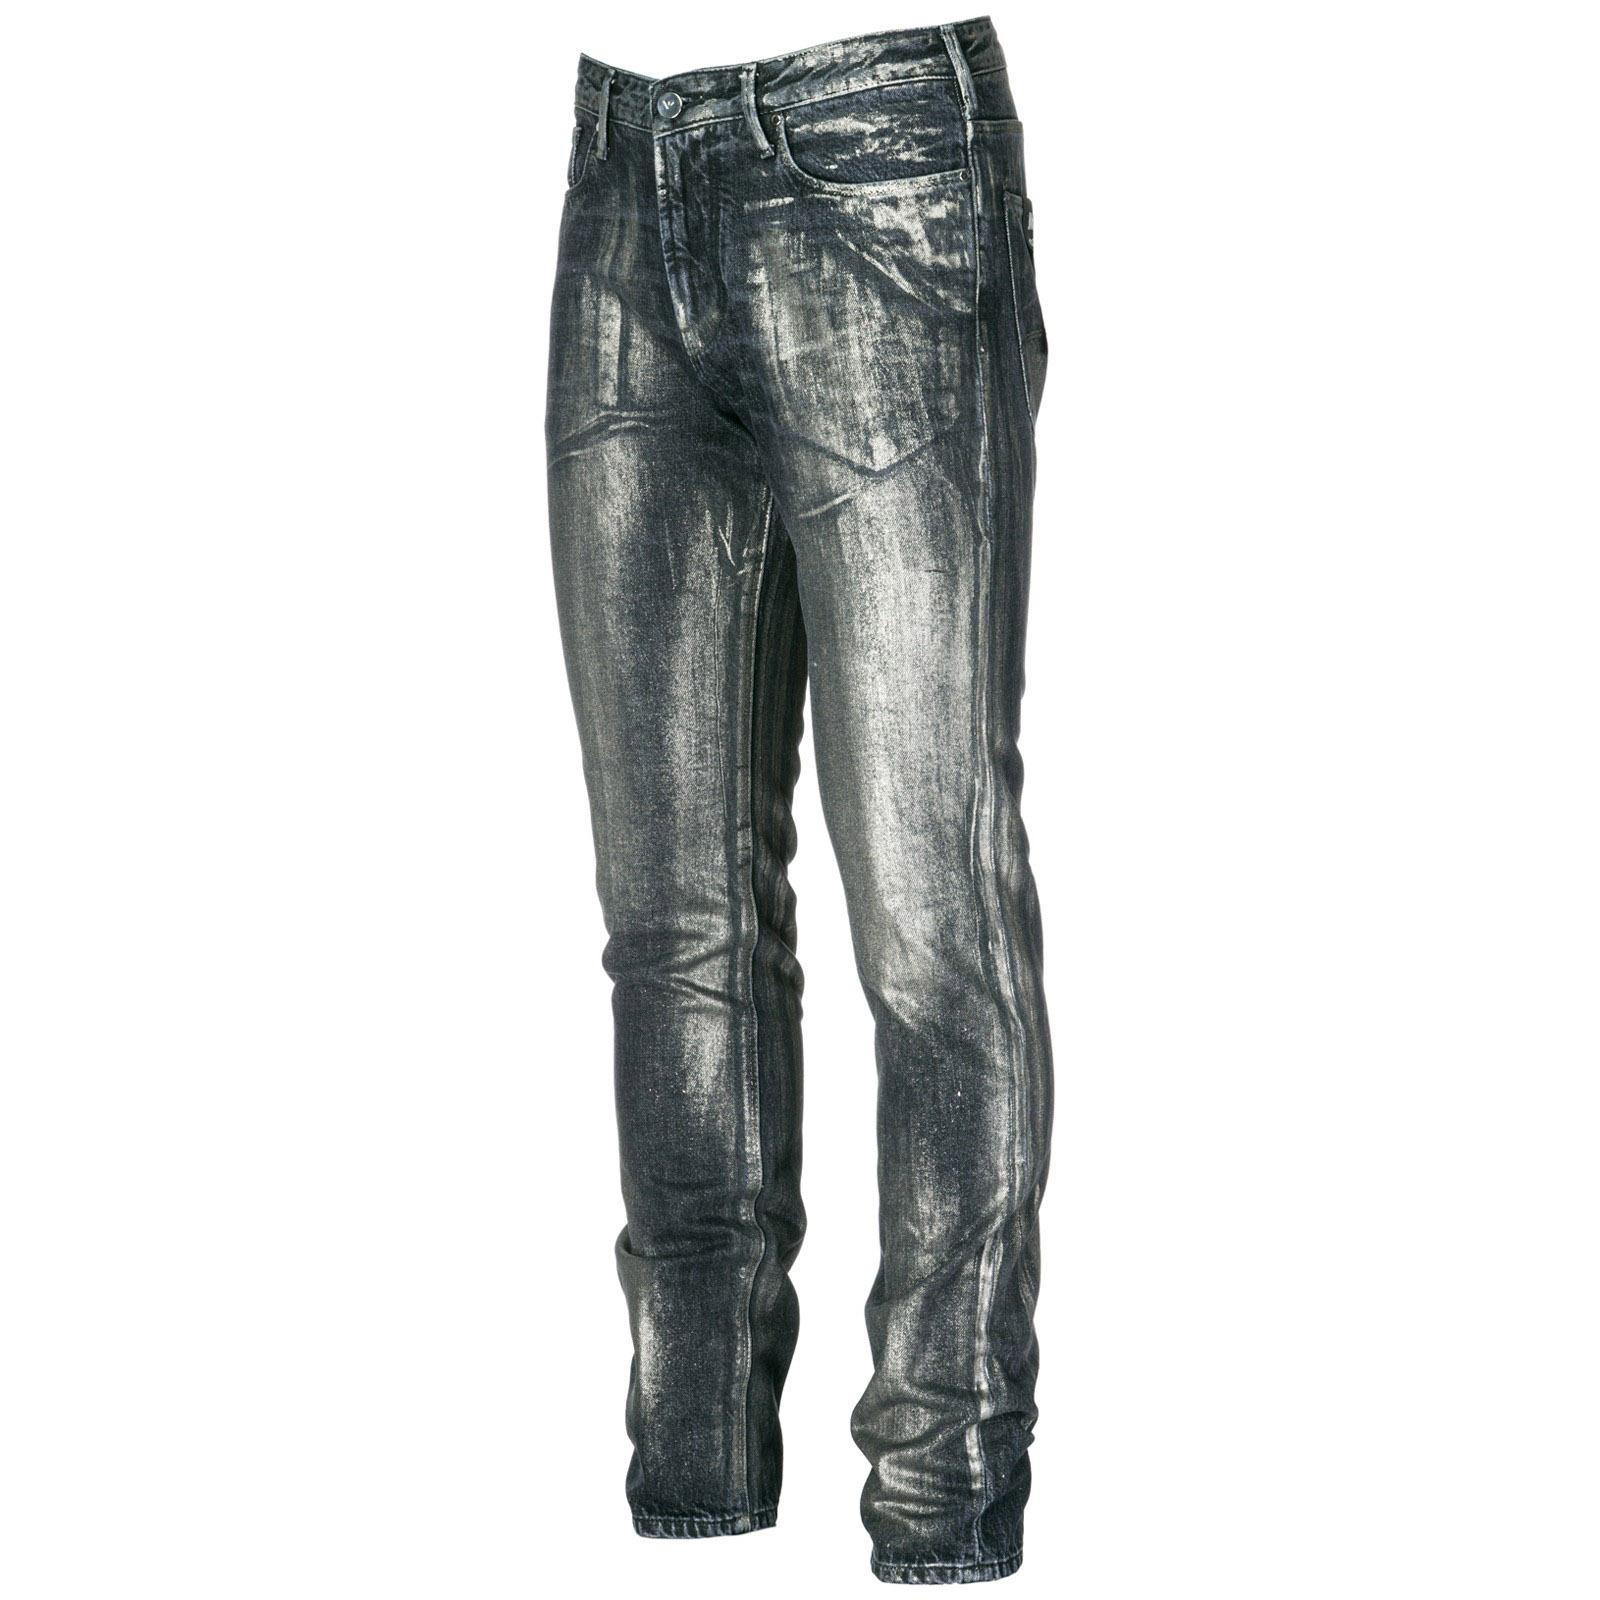 b8888f76c087aa Jeans Emporio Armani 6Z1J061D2EZ0005 denim nero